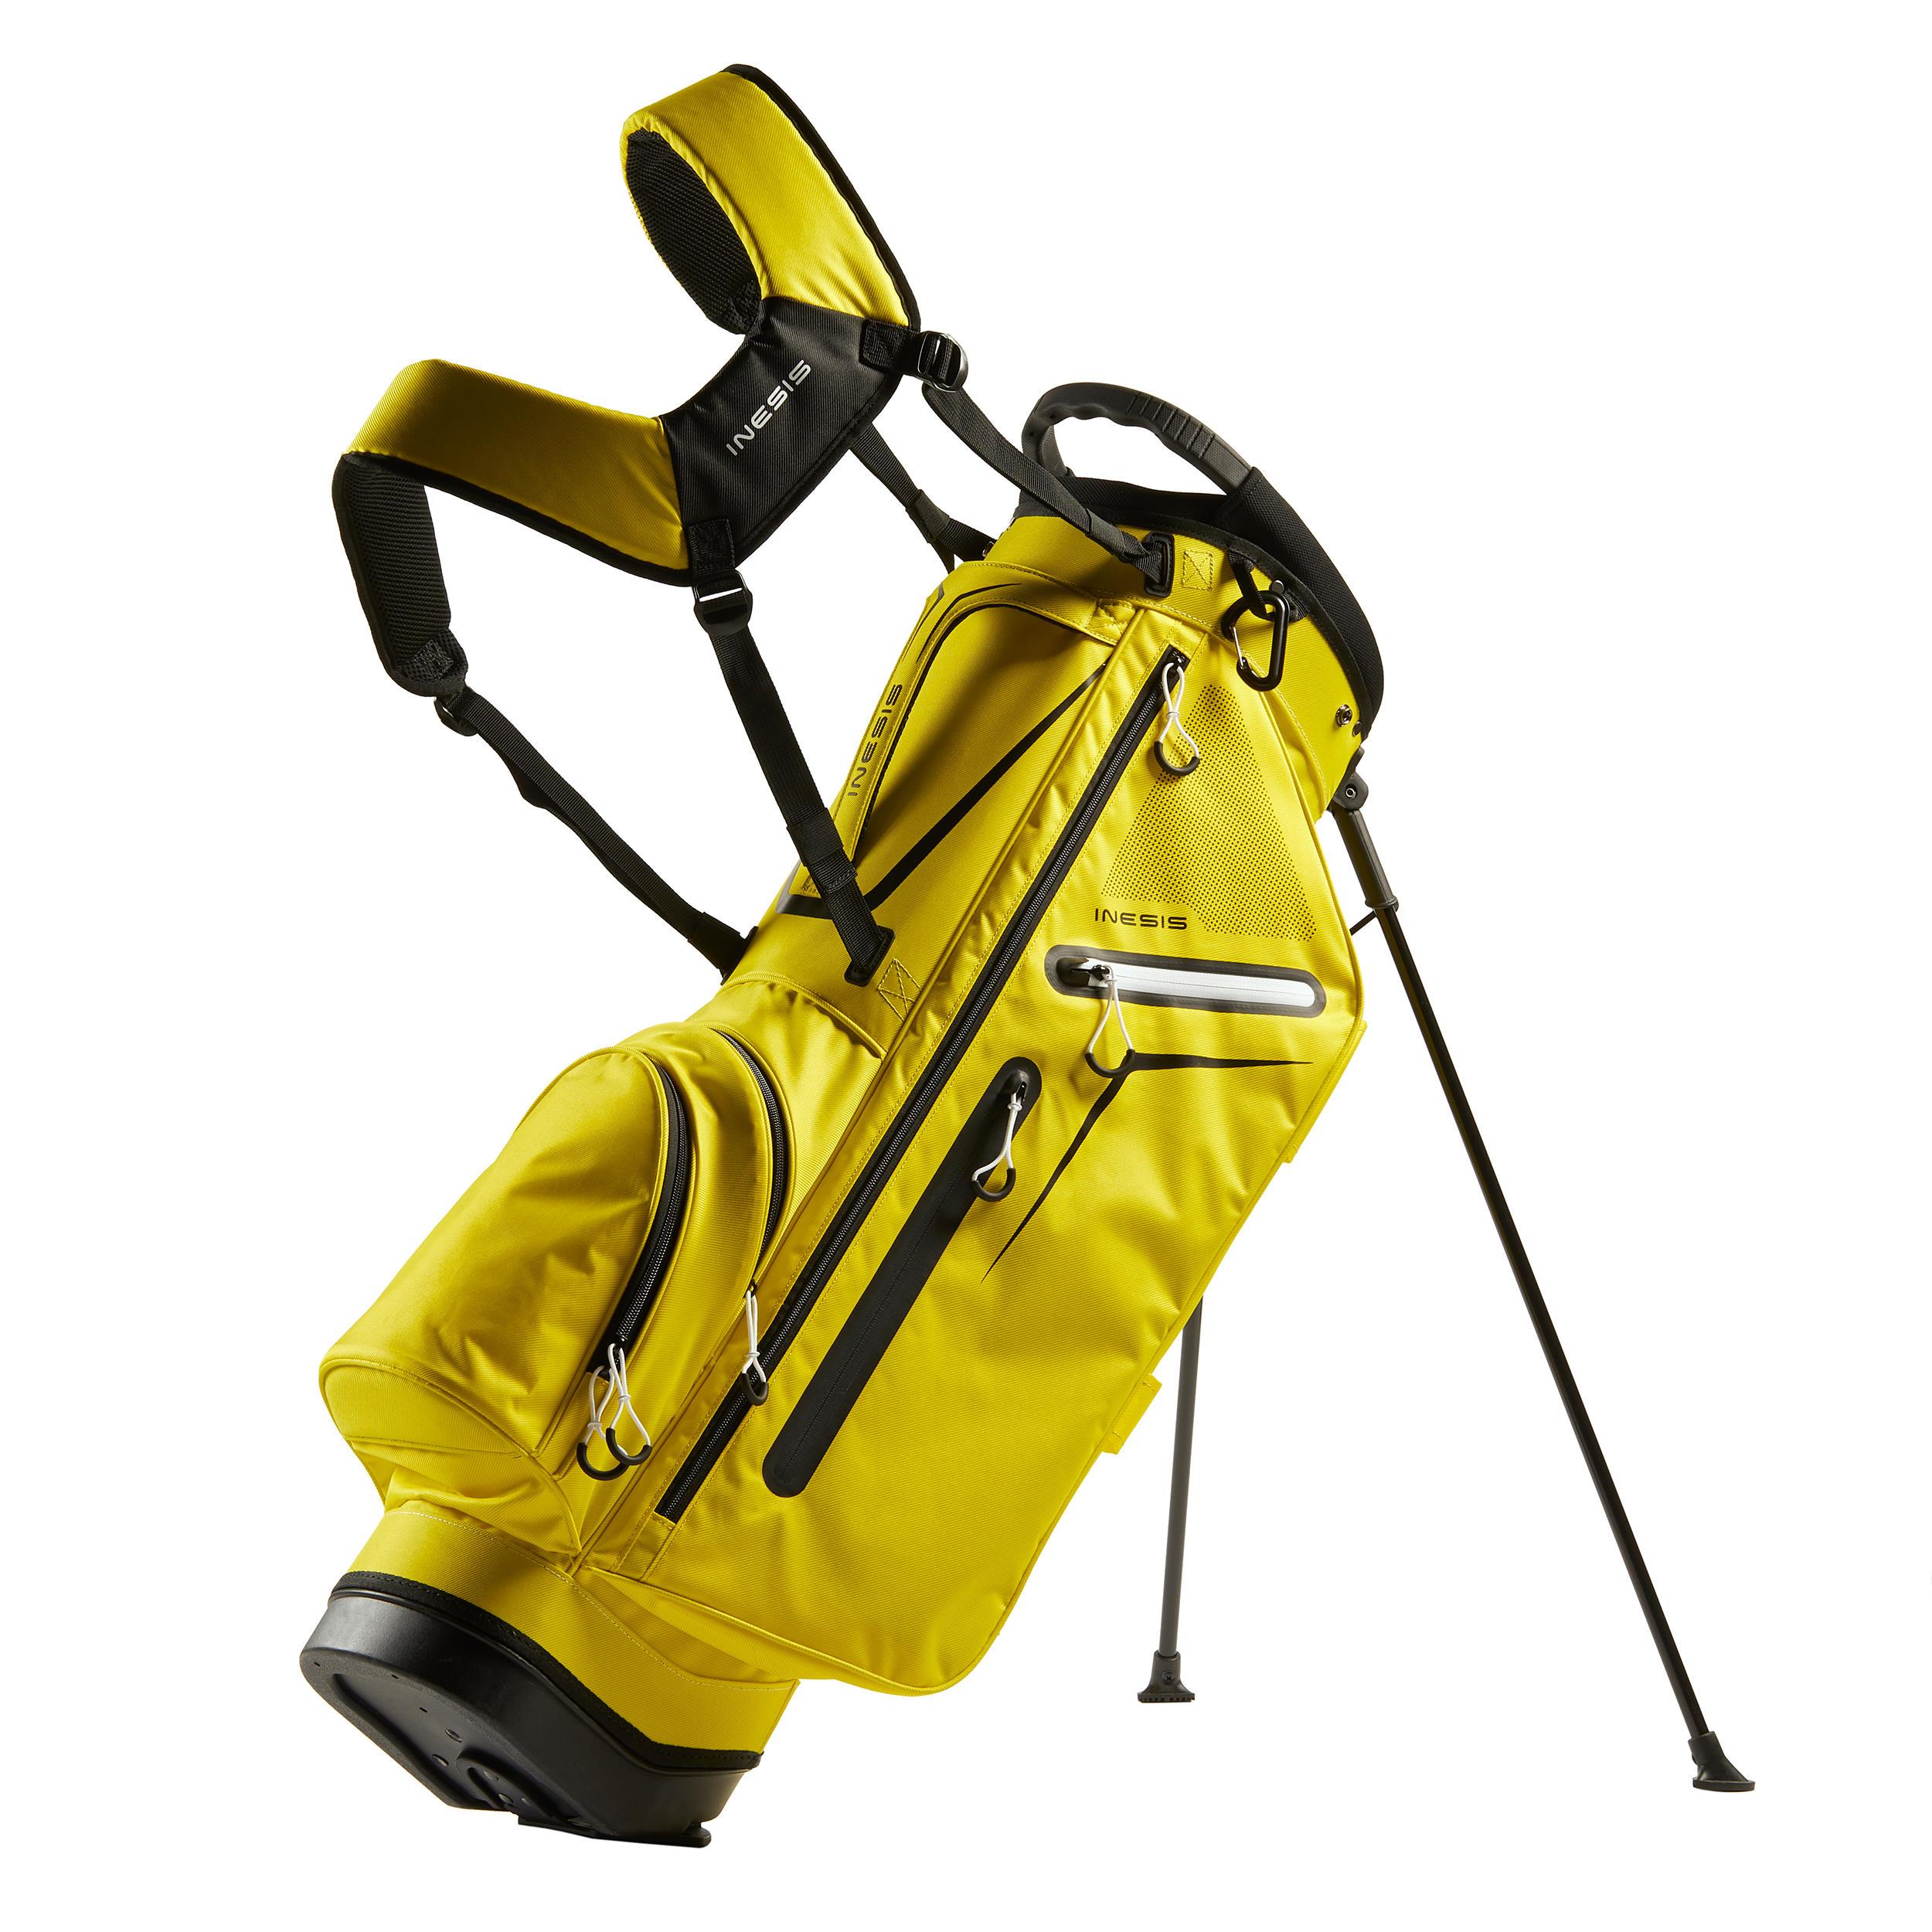 Geantă golf trepied Galben la Reducere poza